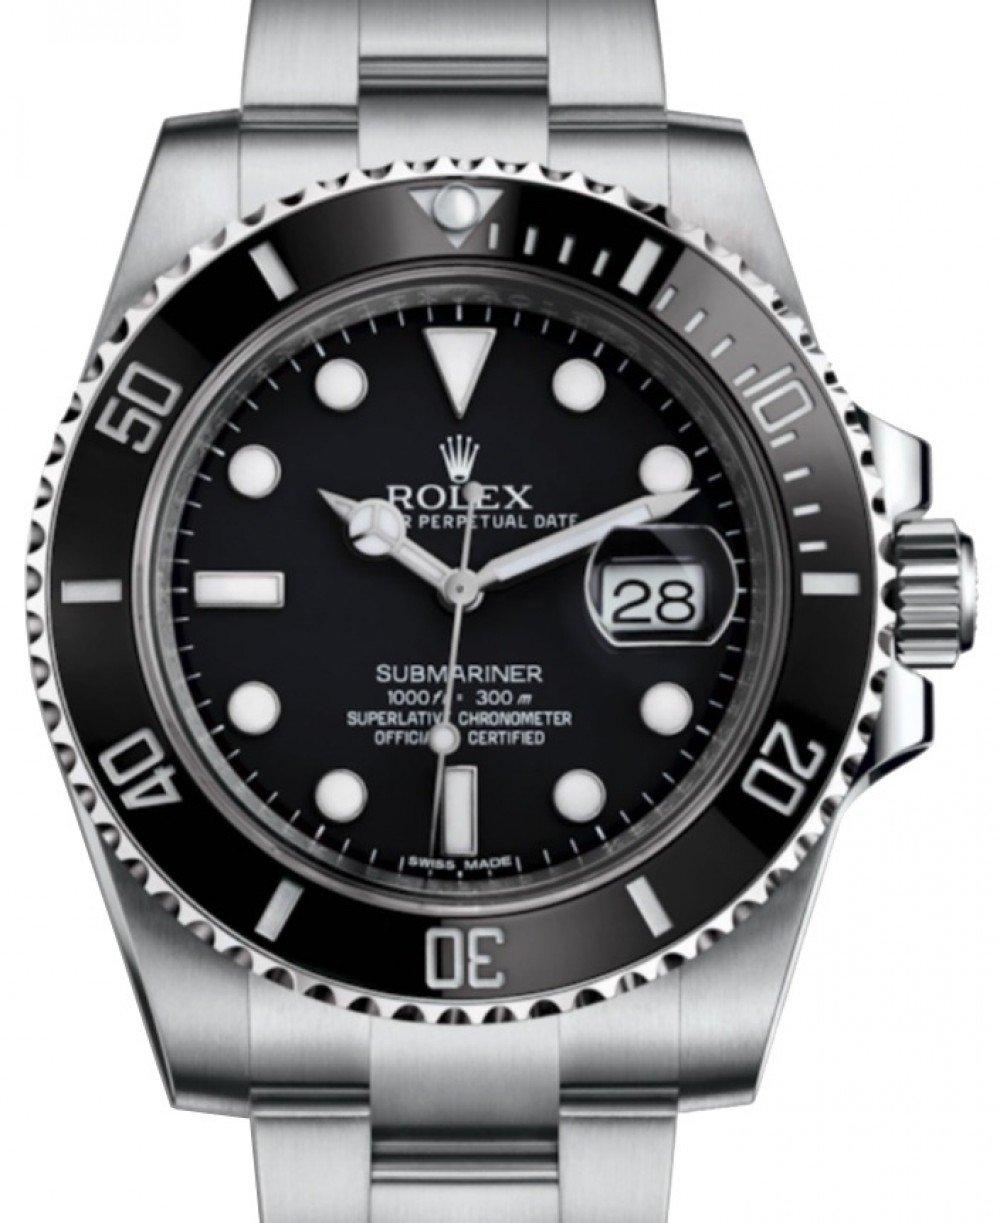 Rolex Submariner Date Stainless Steel Black Dial \u0026 Ceramic Bezel Oyster  Bracelet 116610LN , BRAND NEW